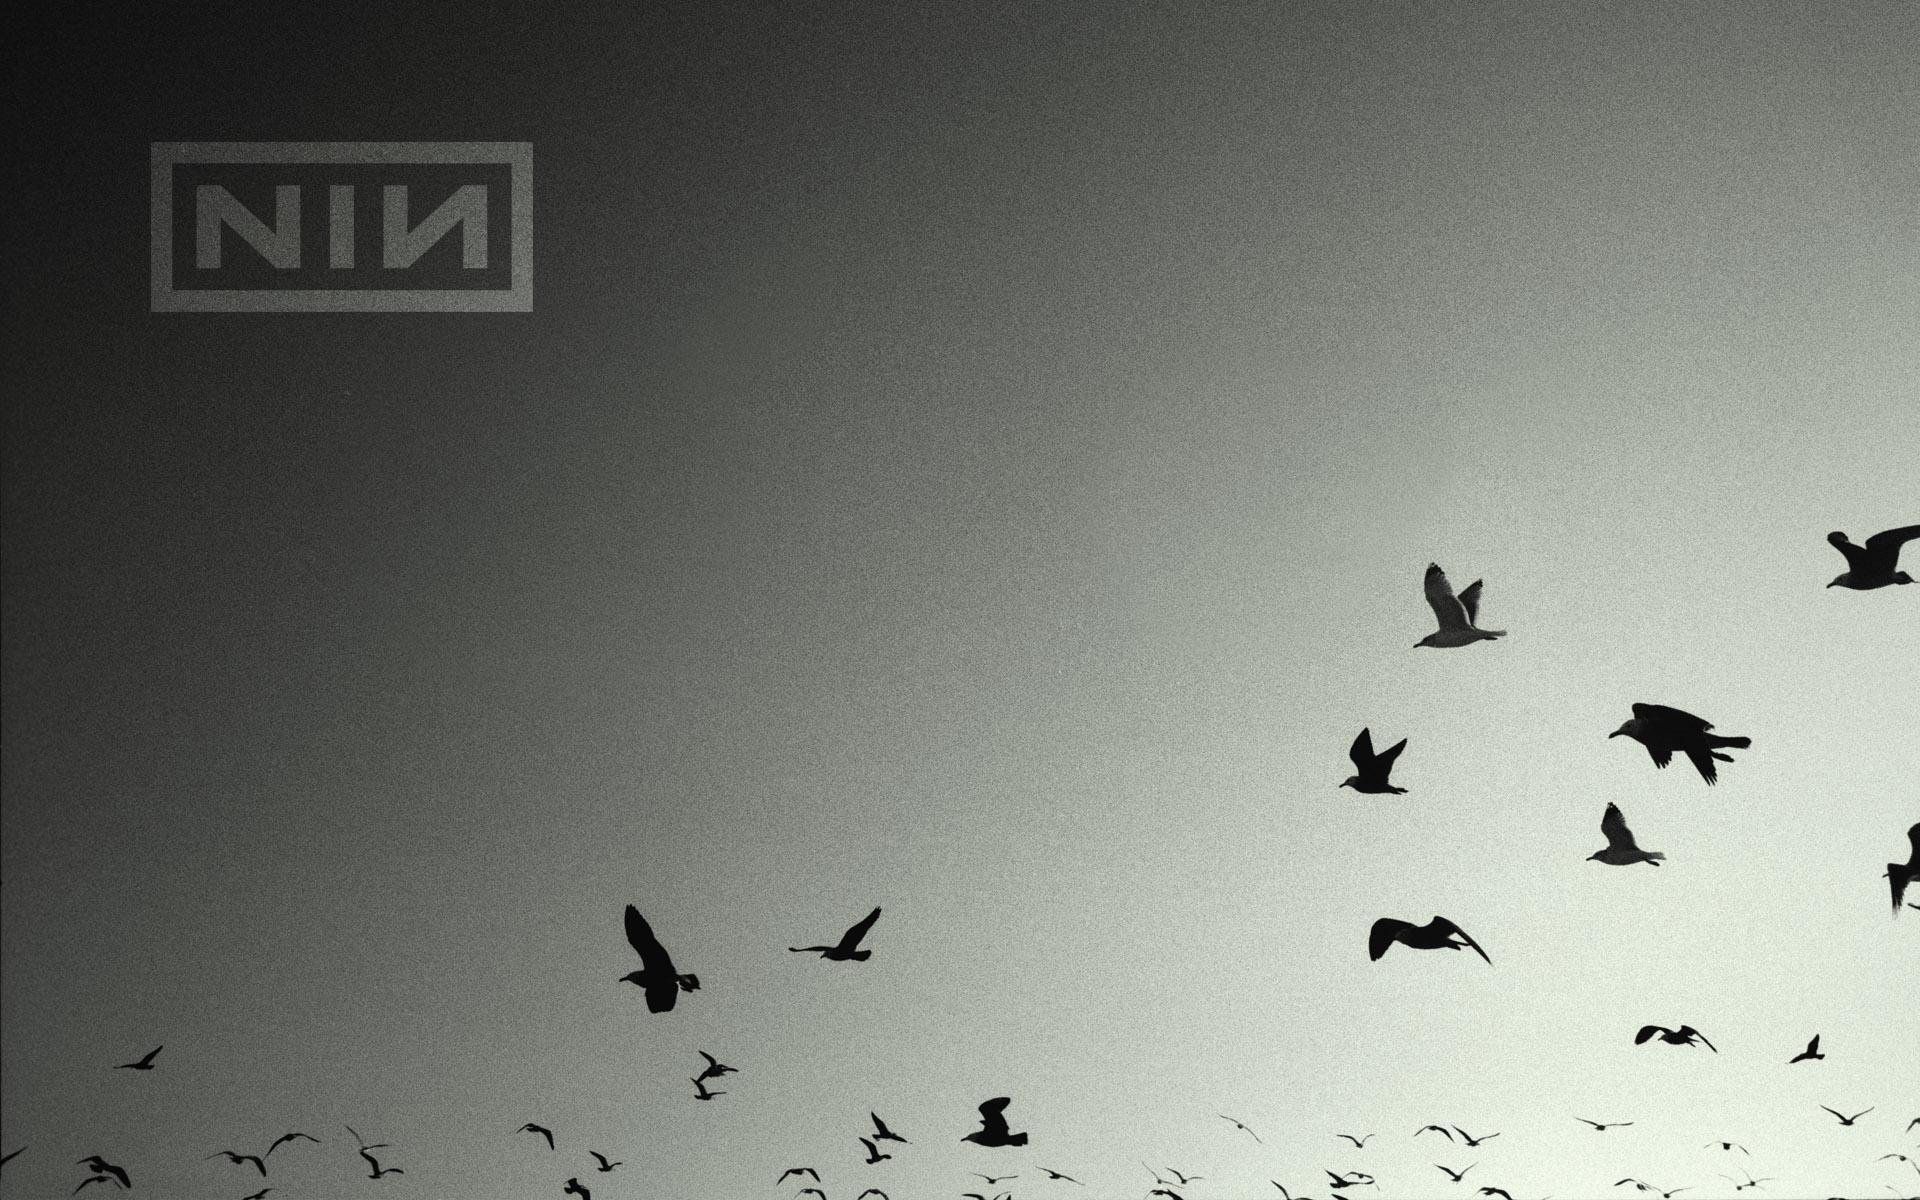 Nine Inch Nails Art - ID: 79658 - Art Abyss